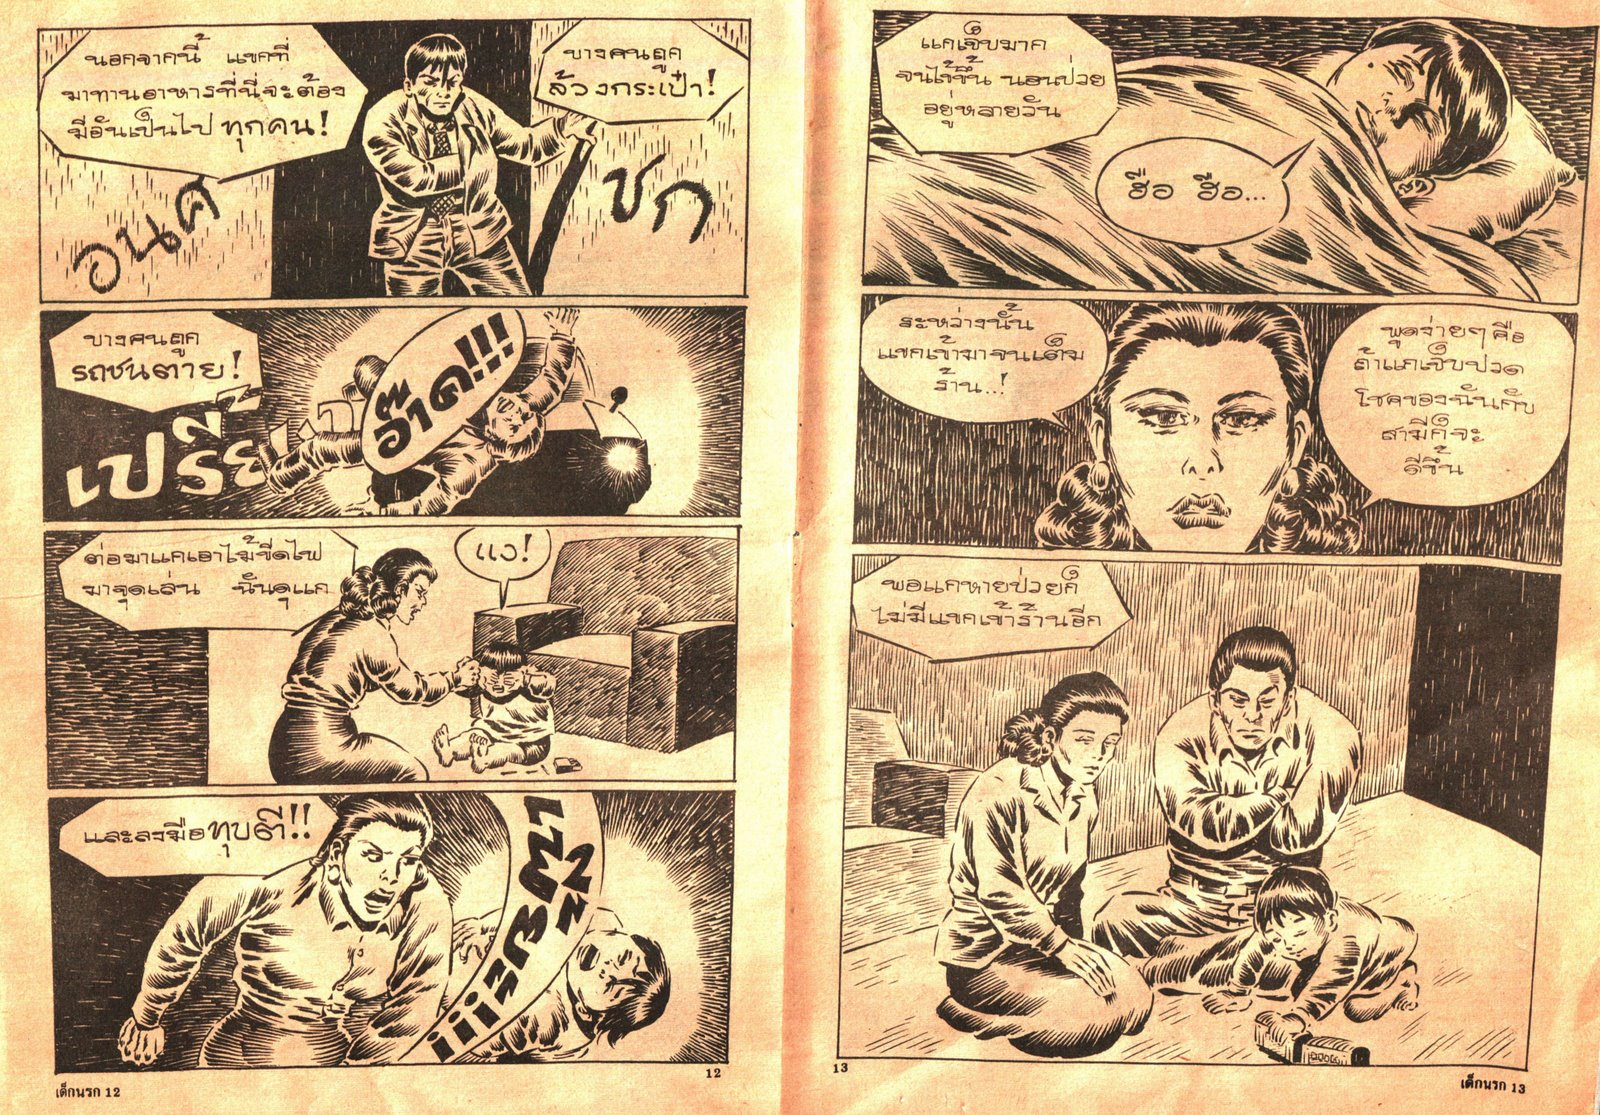 cambodian sadism kids comic - 08